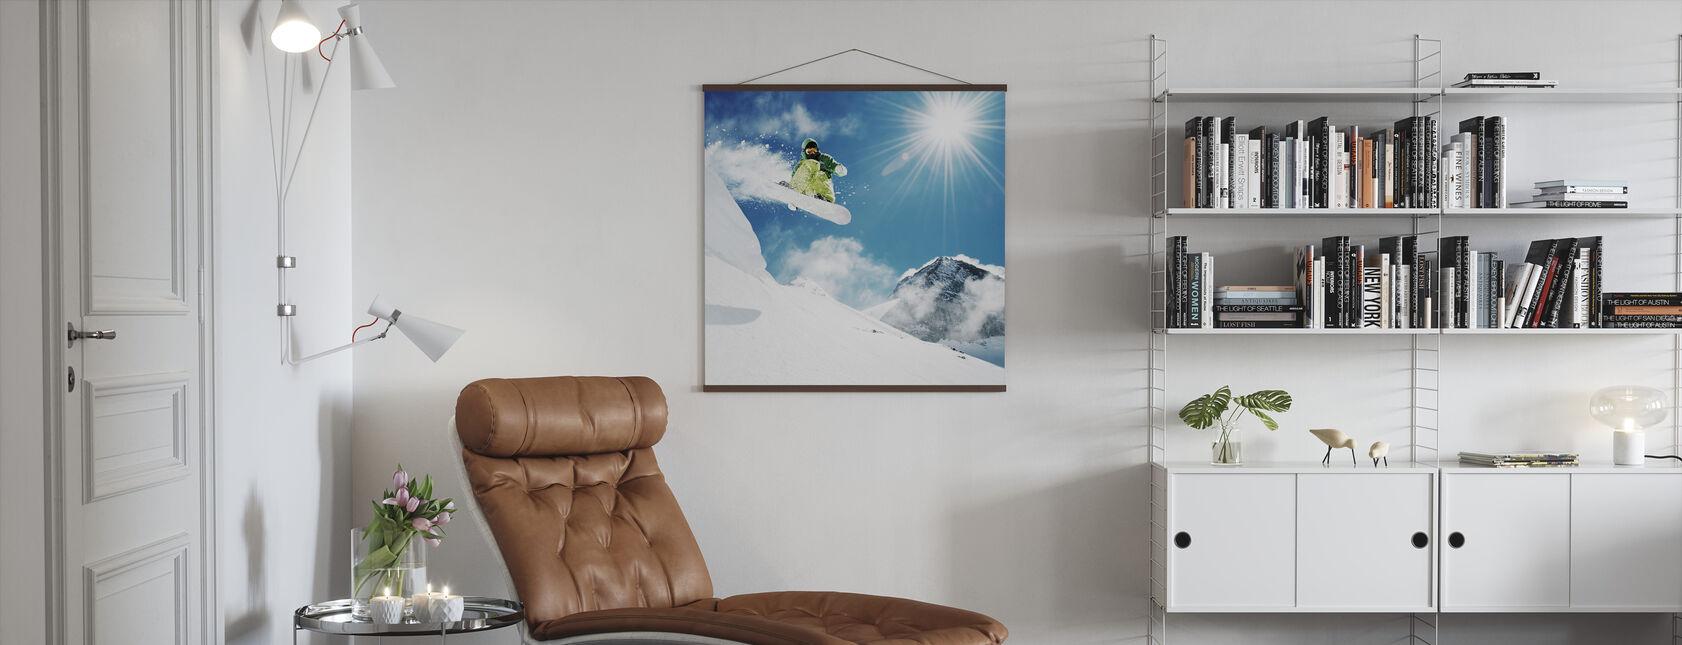 Snowboarder i hopp - Plakat - Stue